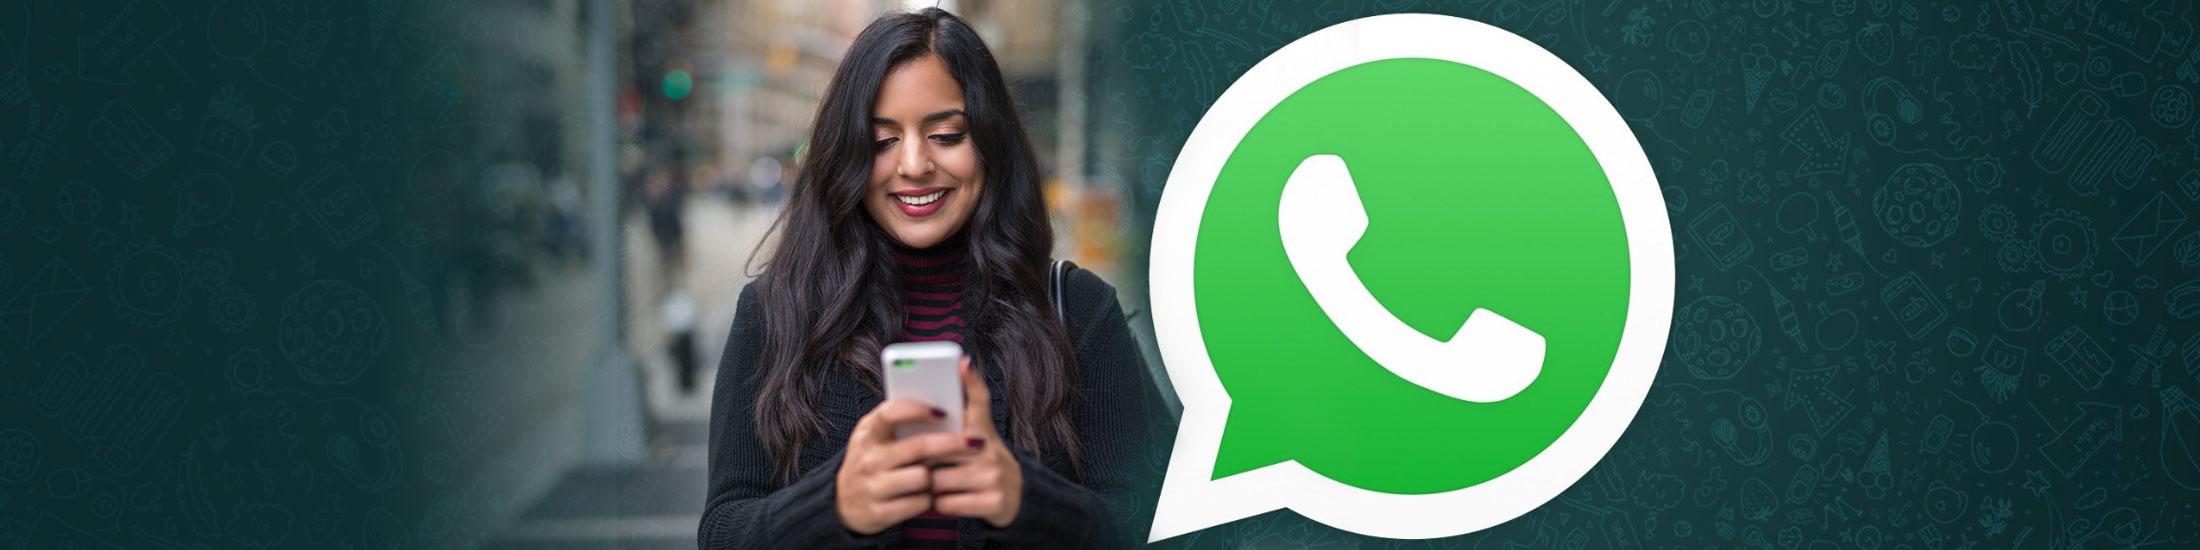 WhatsApp Pay to Enter India